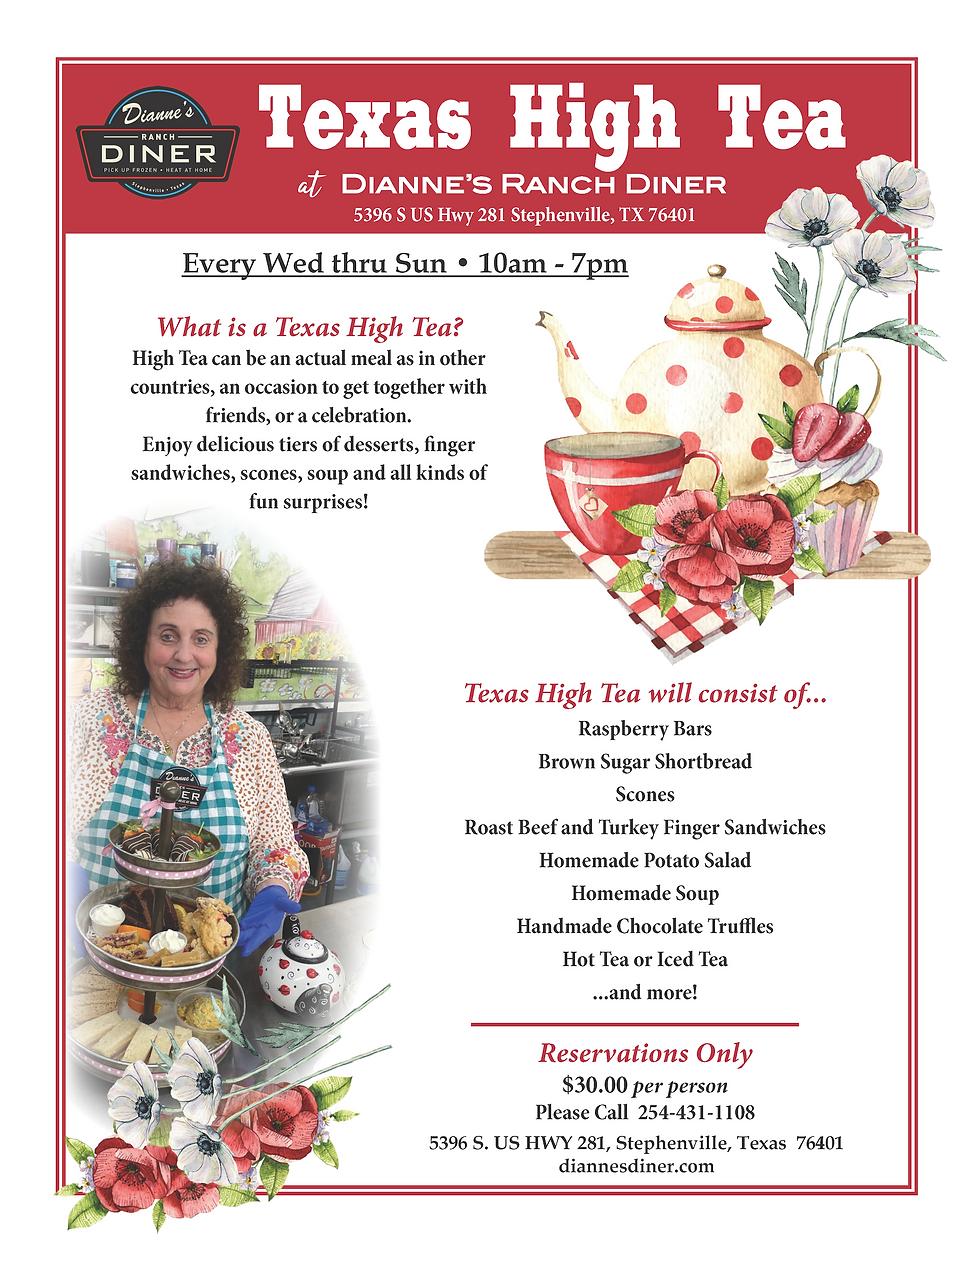 new texas high tea flyer - png.png.sb-e4081a01-Mw4sRG.png